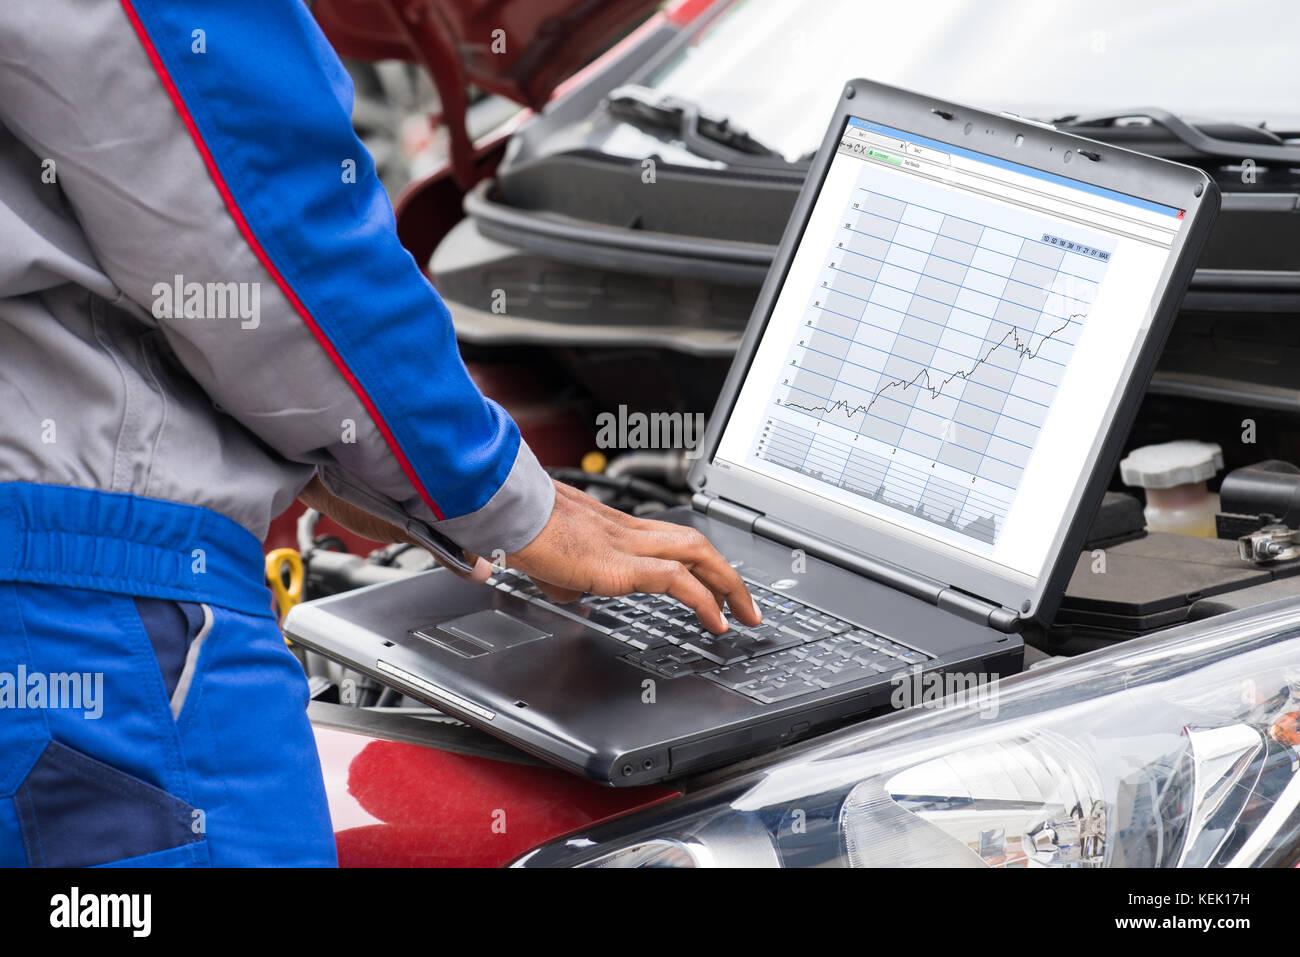 Close-up Of Male Mechanic Using Laptop For Examining Car Engine - Stock Image